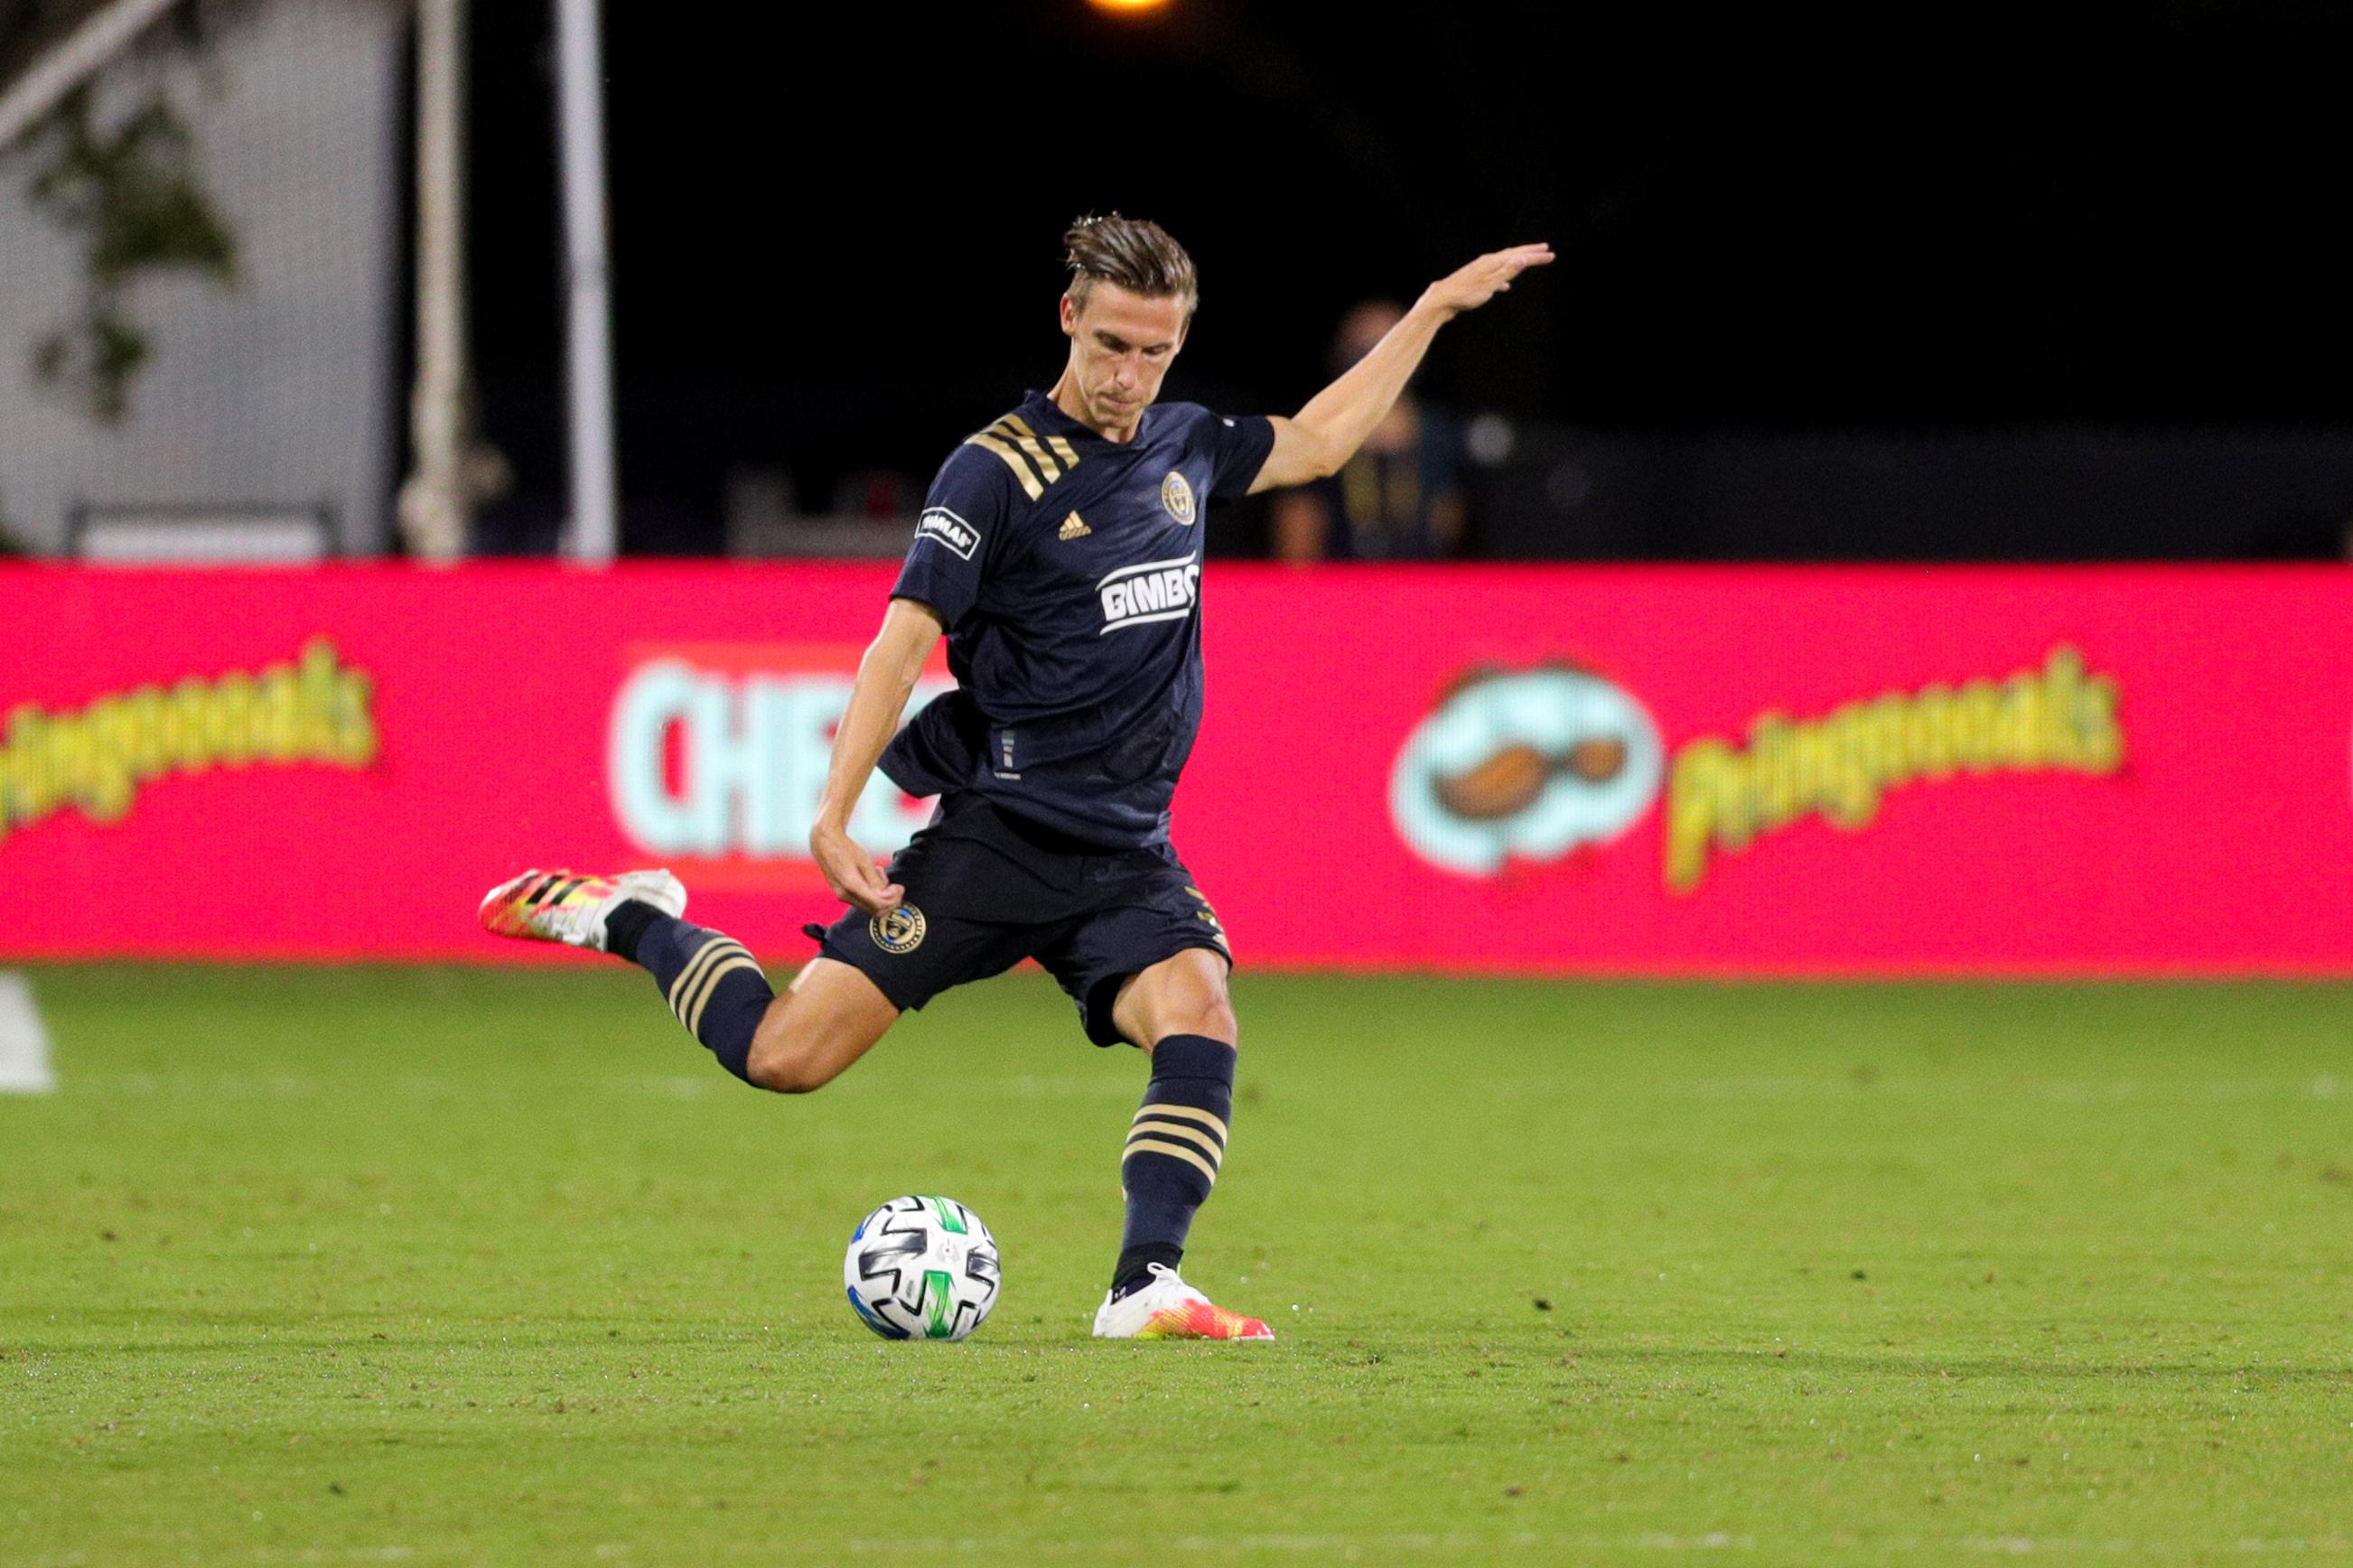 SOCCER: JUL 20 MLS - Orlando City SC v Philadelphia Union